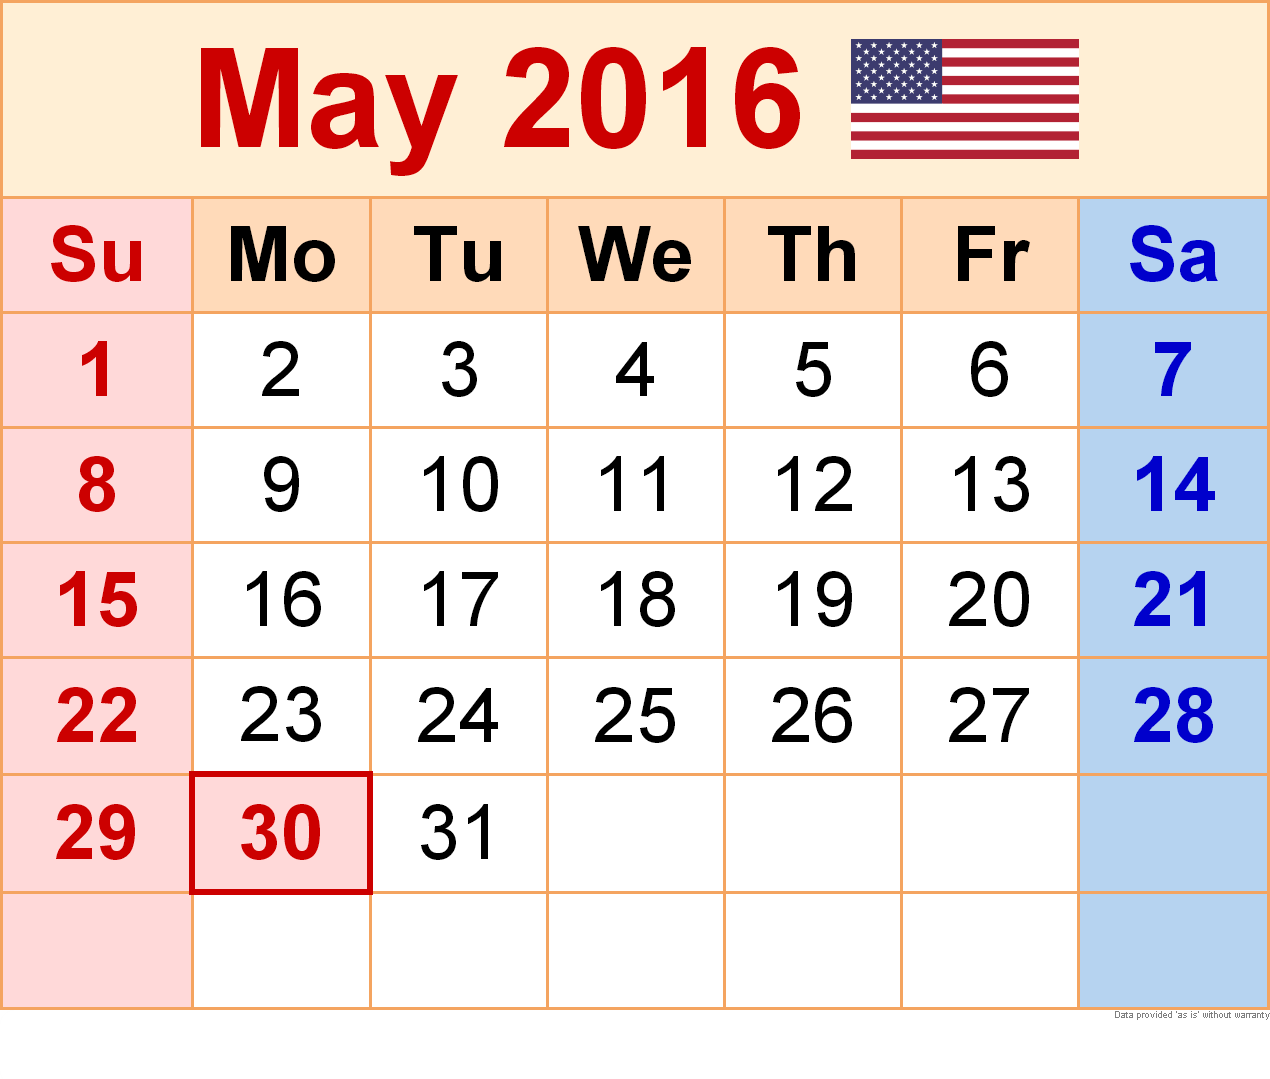 May 2016 Blank Printable Calendar.